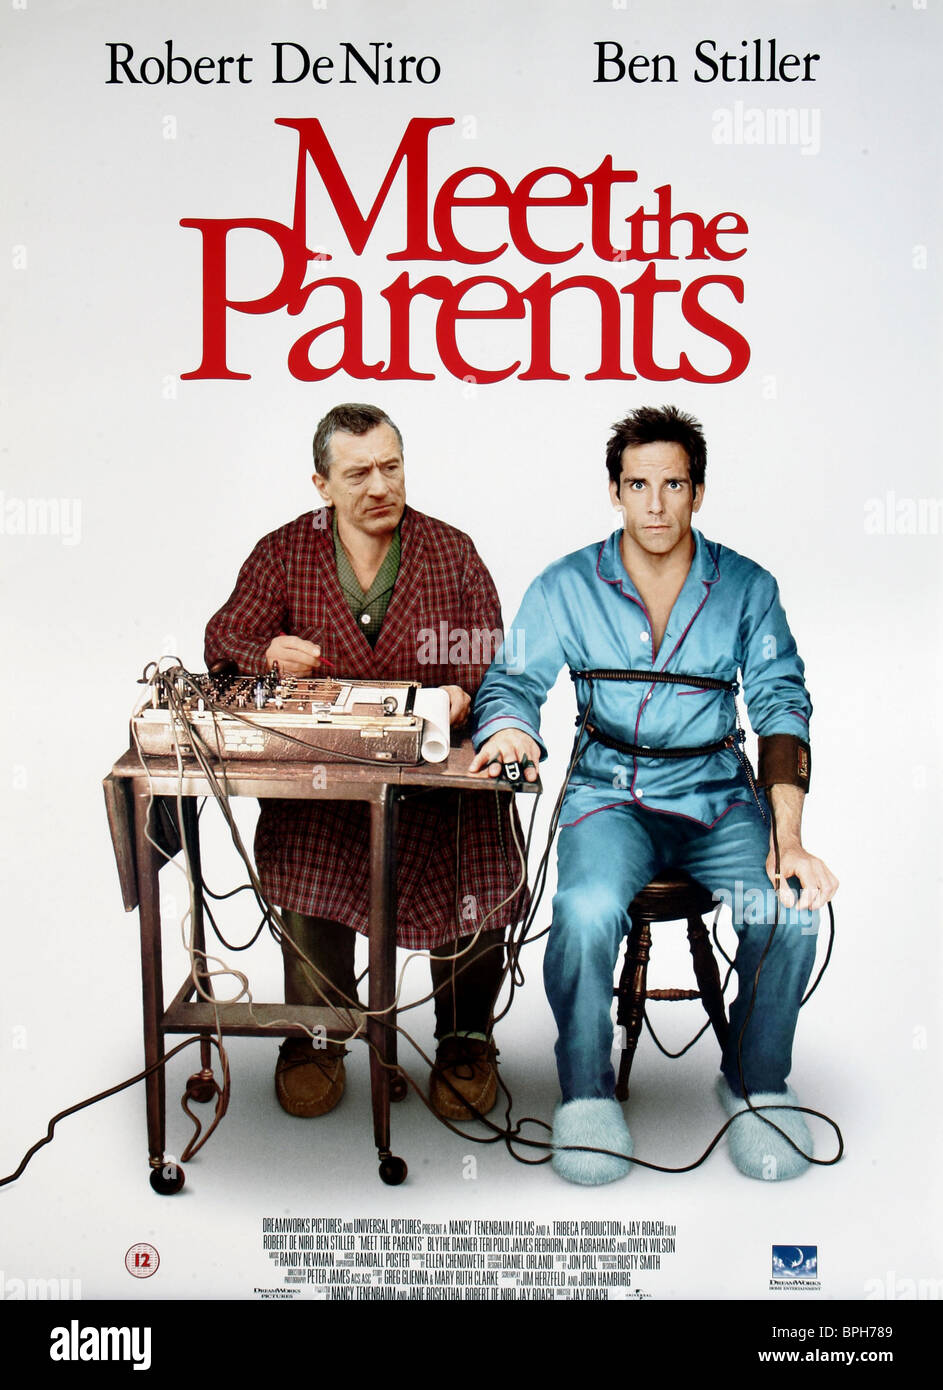 ROBERT DE NIRO & BEN STILLER POSTER MEET THE PARENTS (2000) - Stock Image